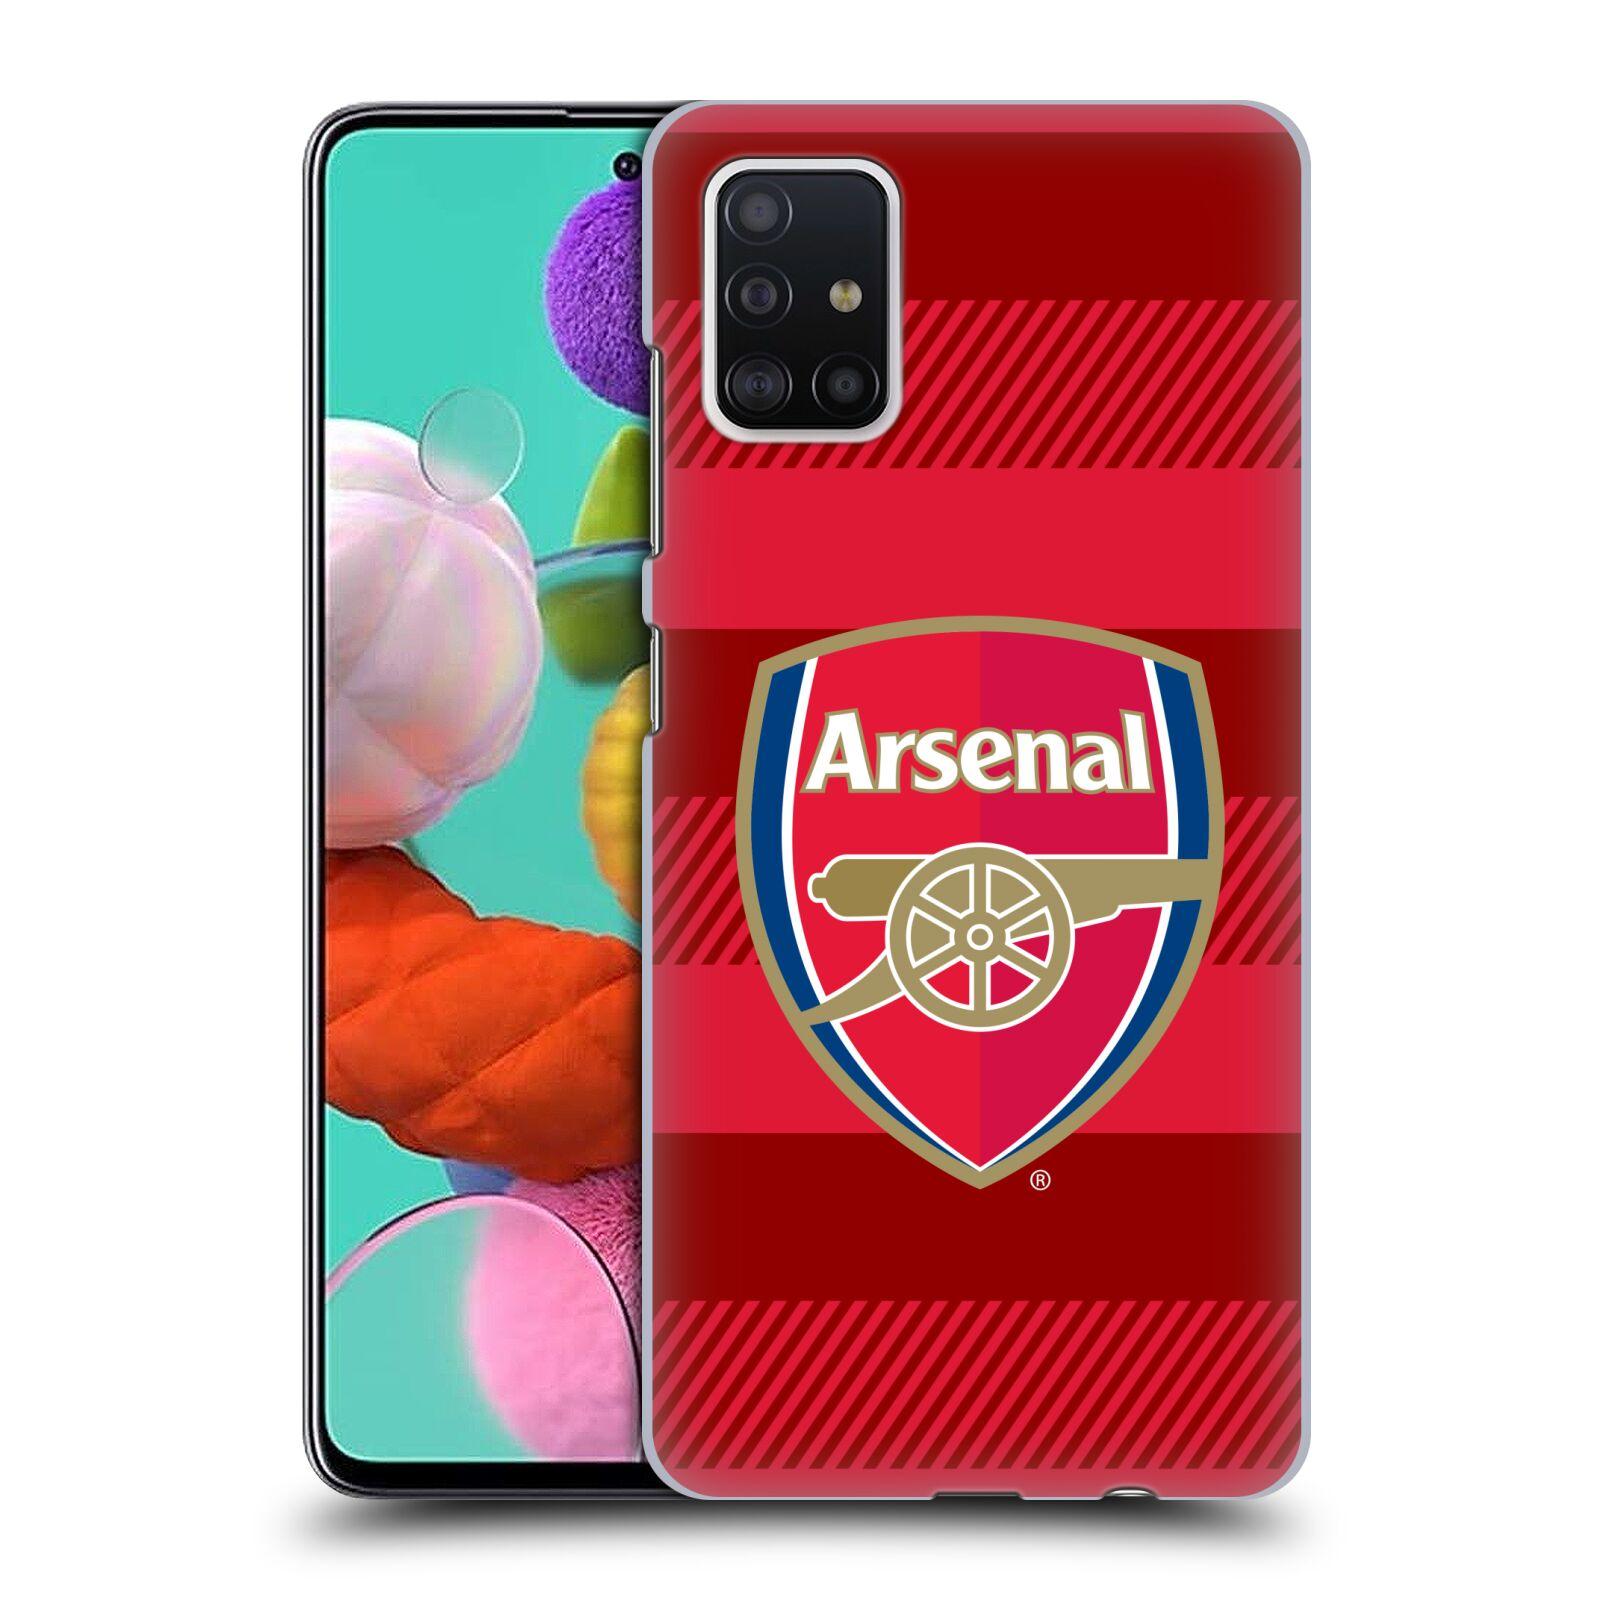 Plastové pouzdro na mobil Samsung Galaxy A51 - Head Case - Arsenal FC - Logo s pruhy